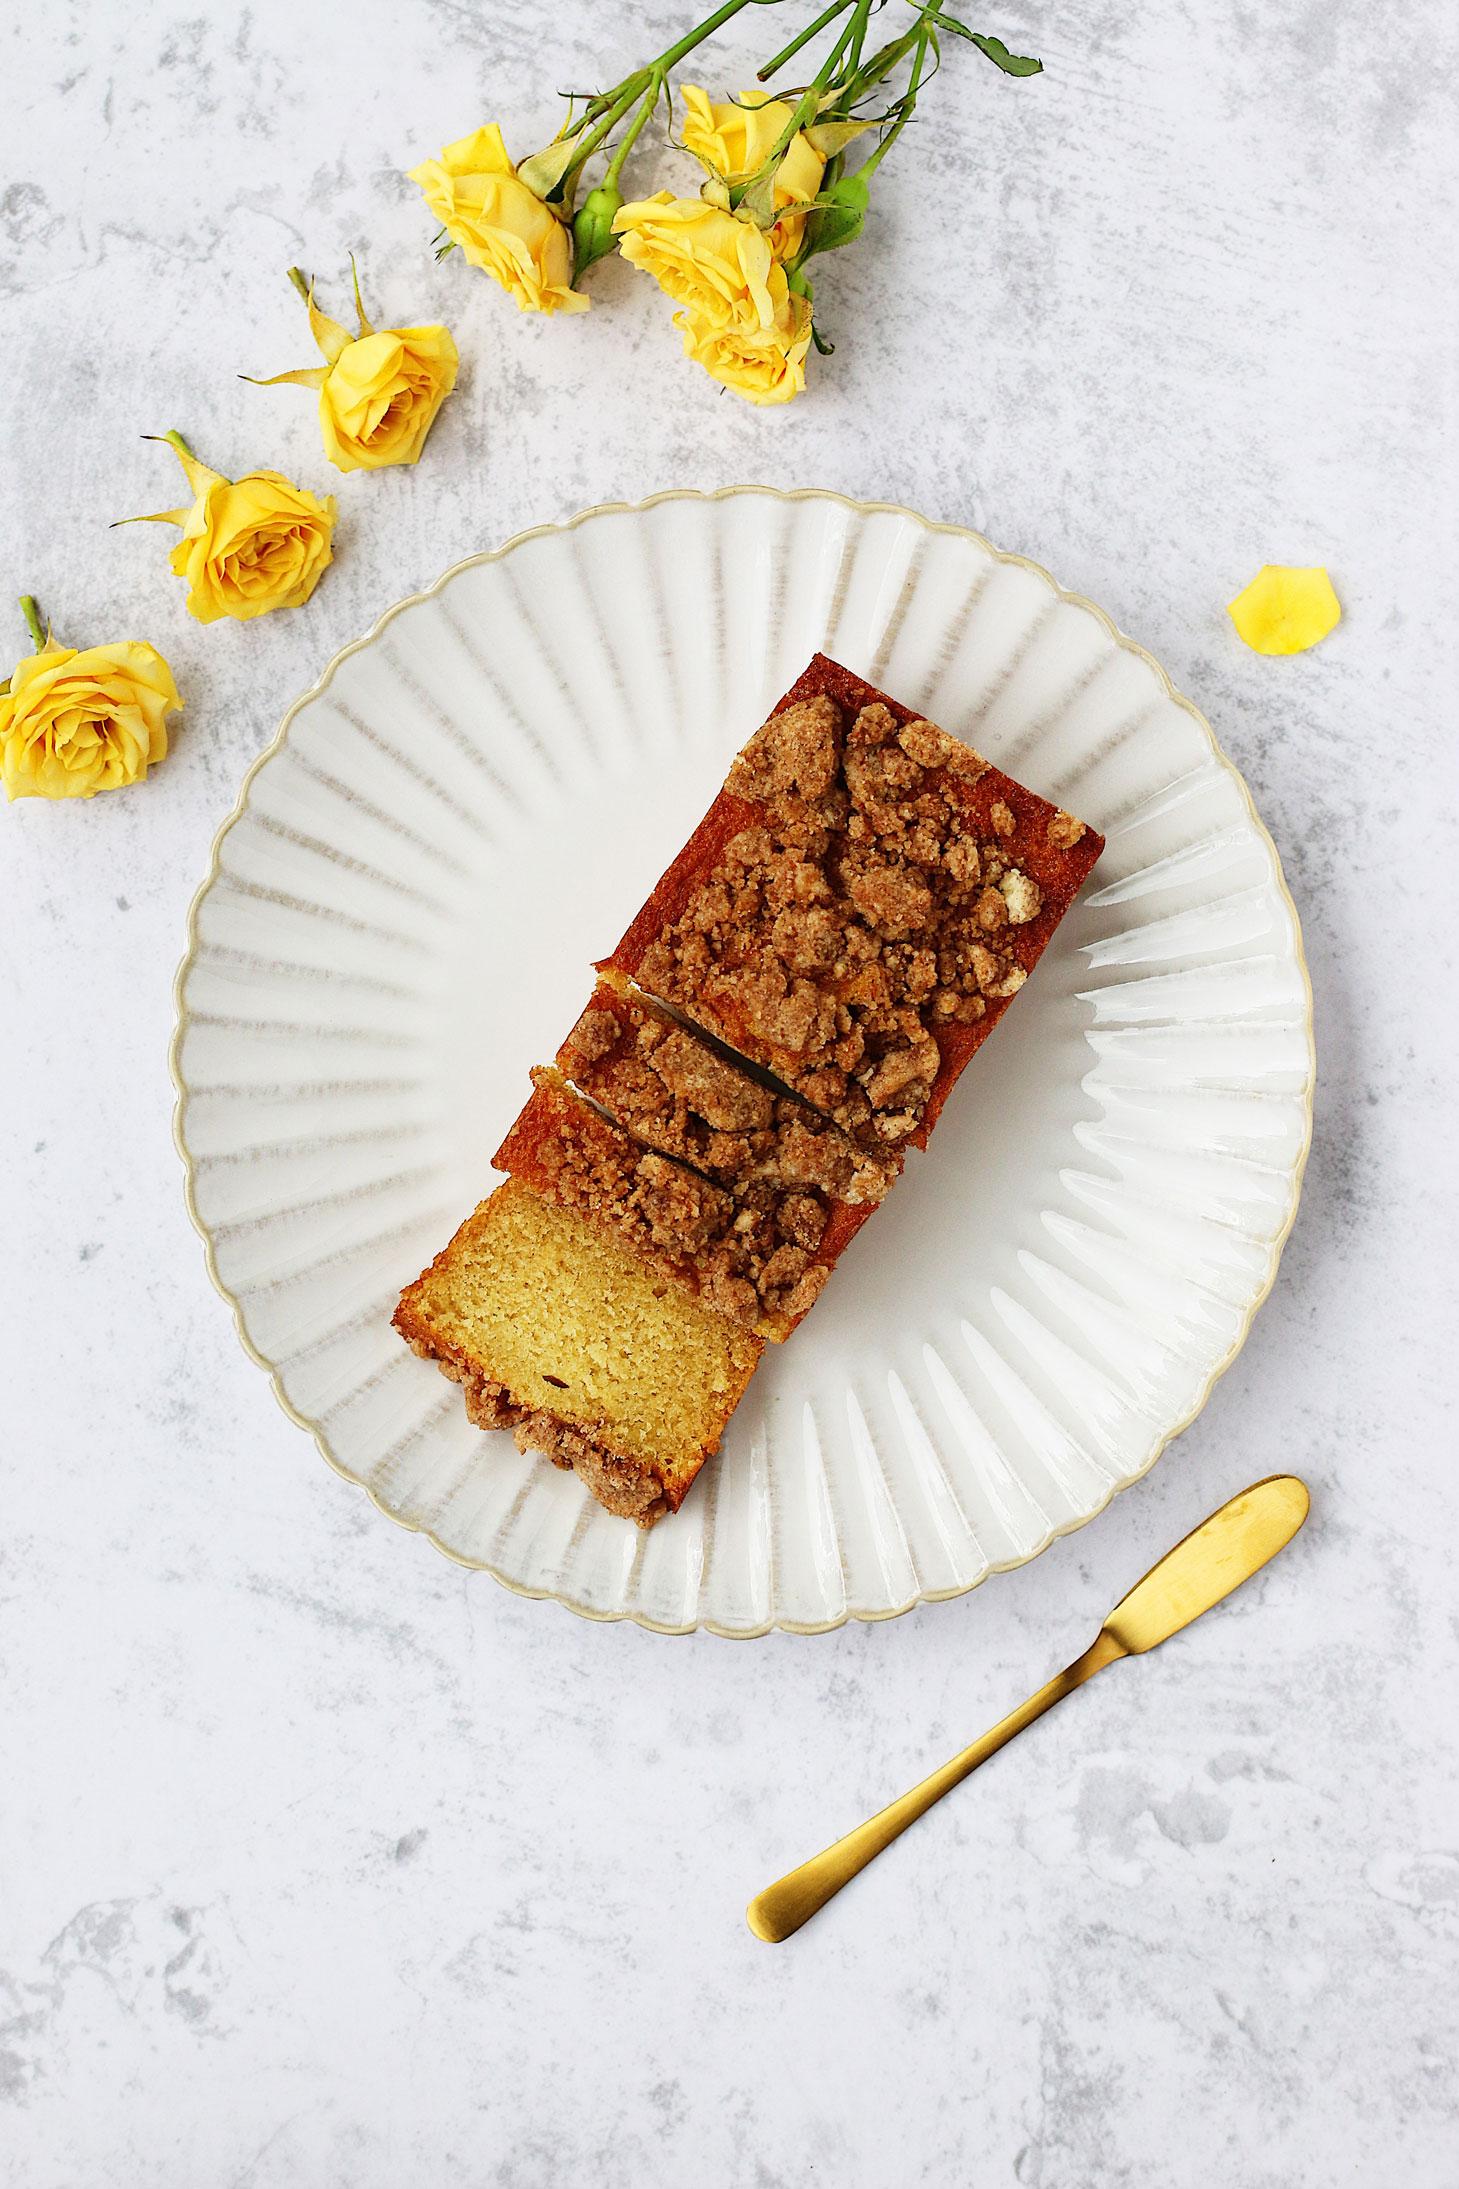 herbakinglab-copycat-trader-joe's-pancake-bread-recipe-on-plate